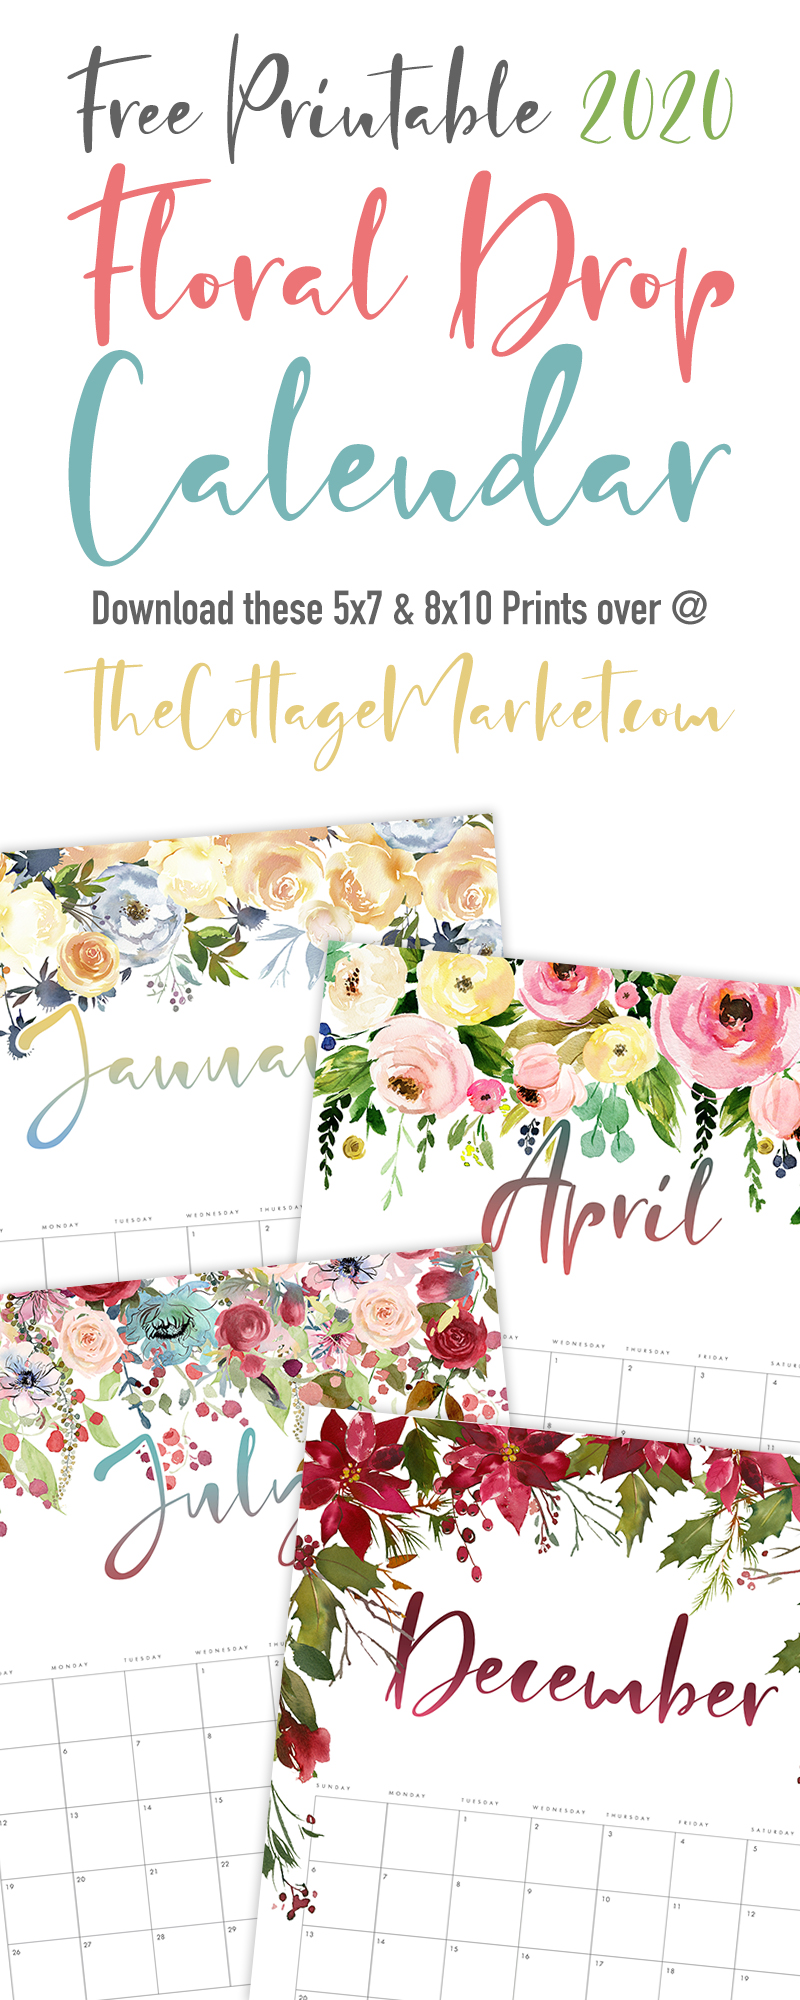 https://thecottagemarket.com/wp-content/uploads/2019/12/TCM-FloralDrop-Calendar-t-1.jpg